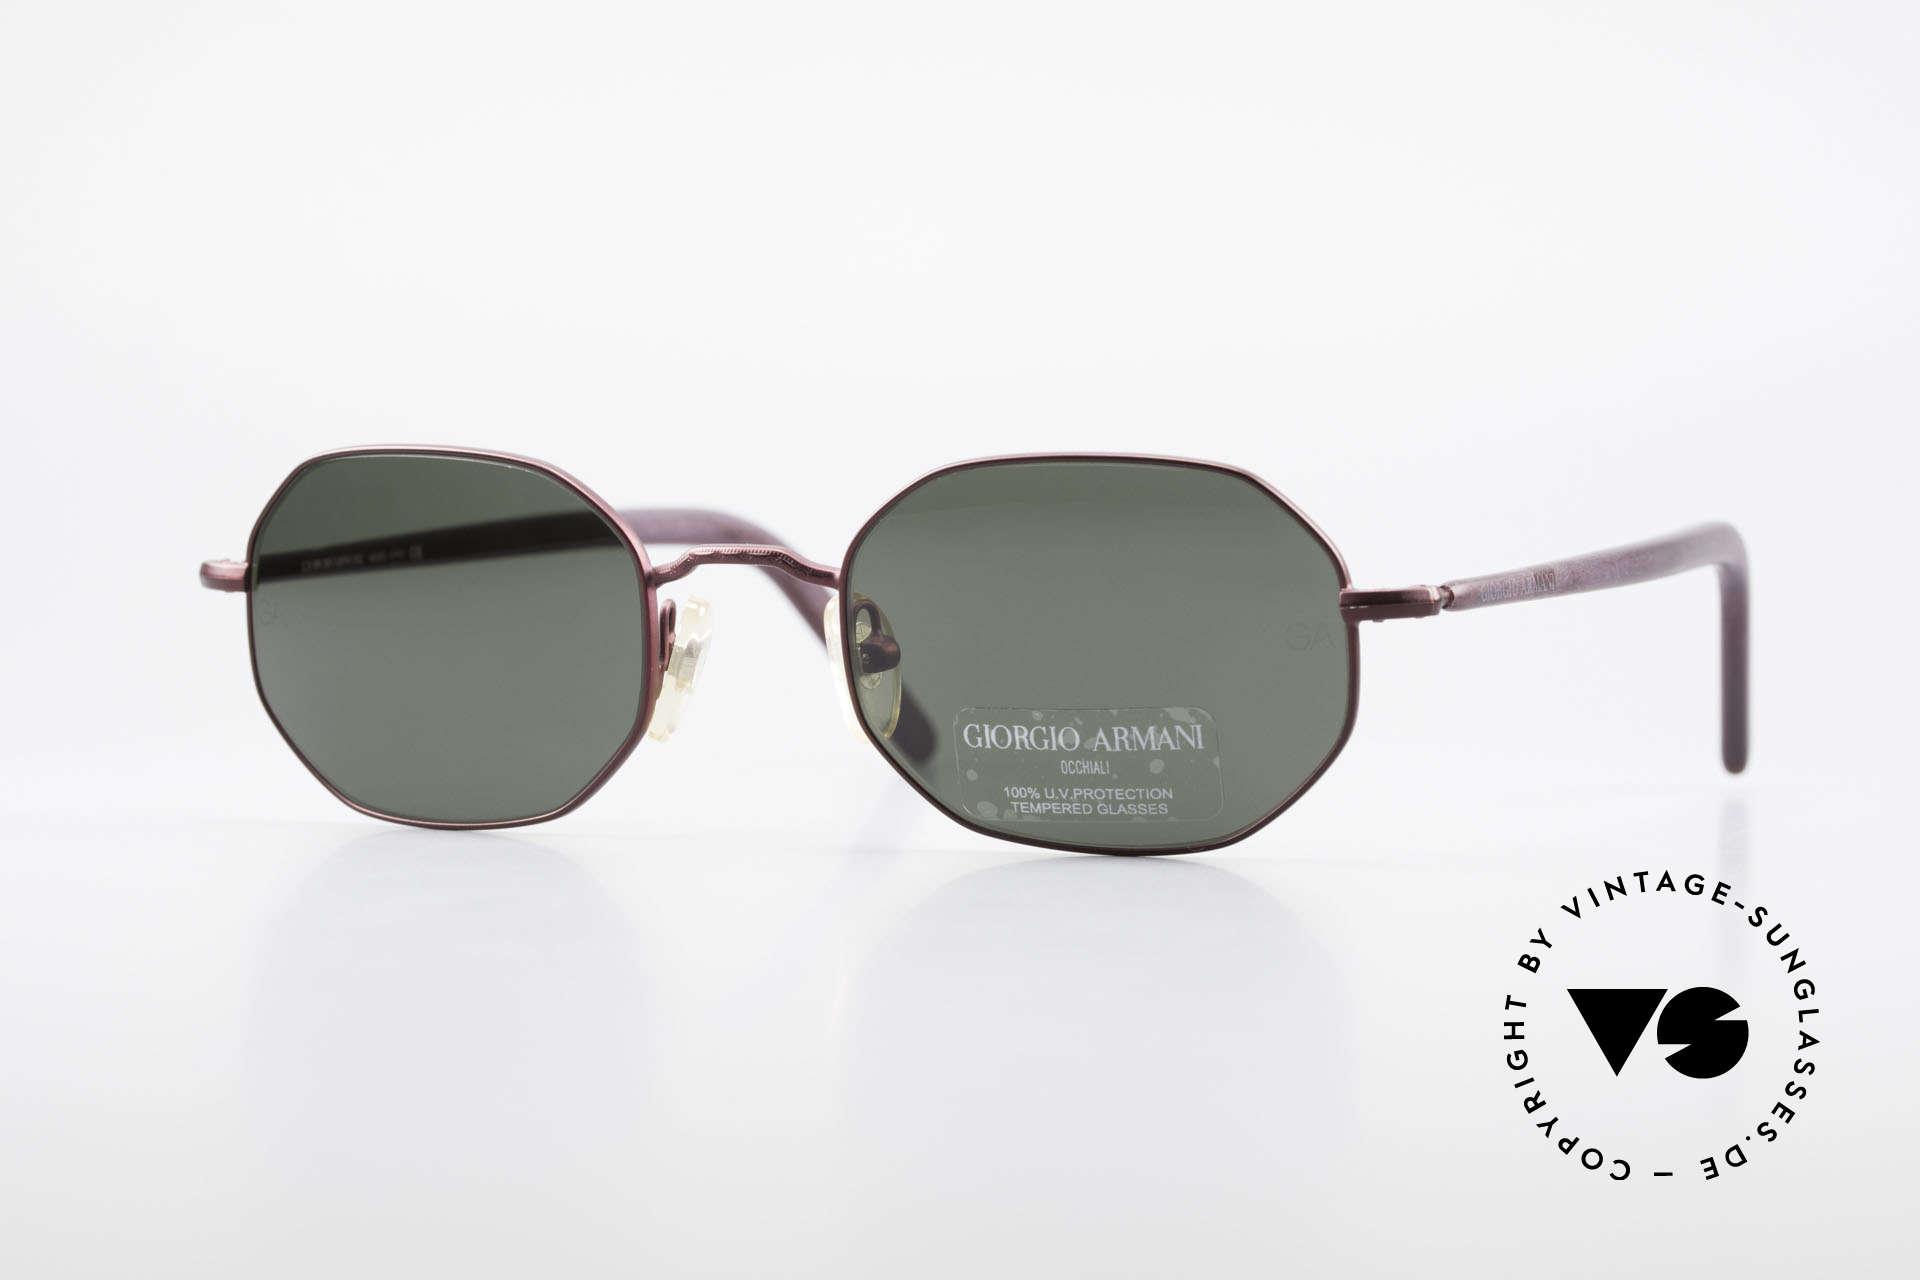 Giorgio Armani 664 Octagonal Vintage Sunglasses, rare vintage sunglasses by famous Giorgio Armani, Made for Men and Women